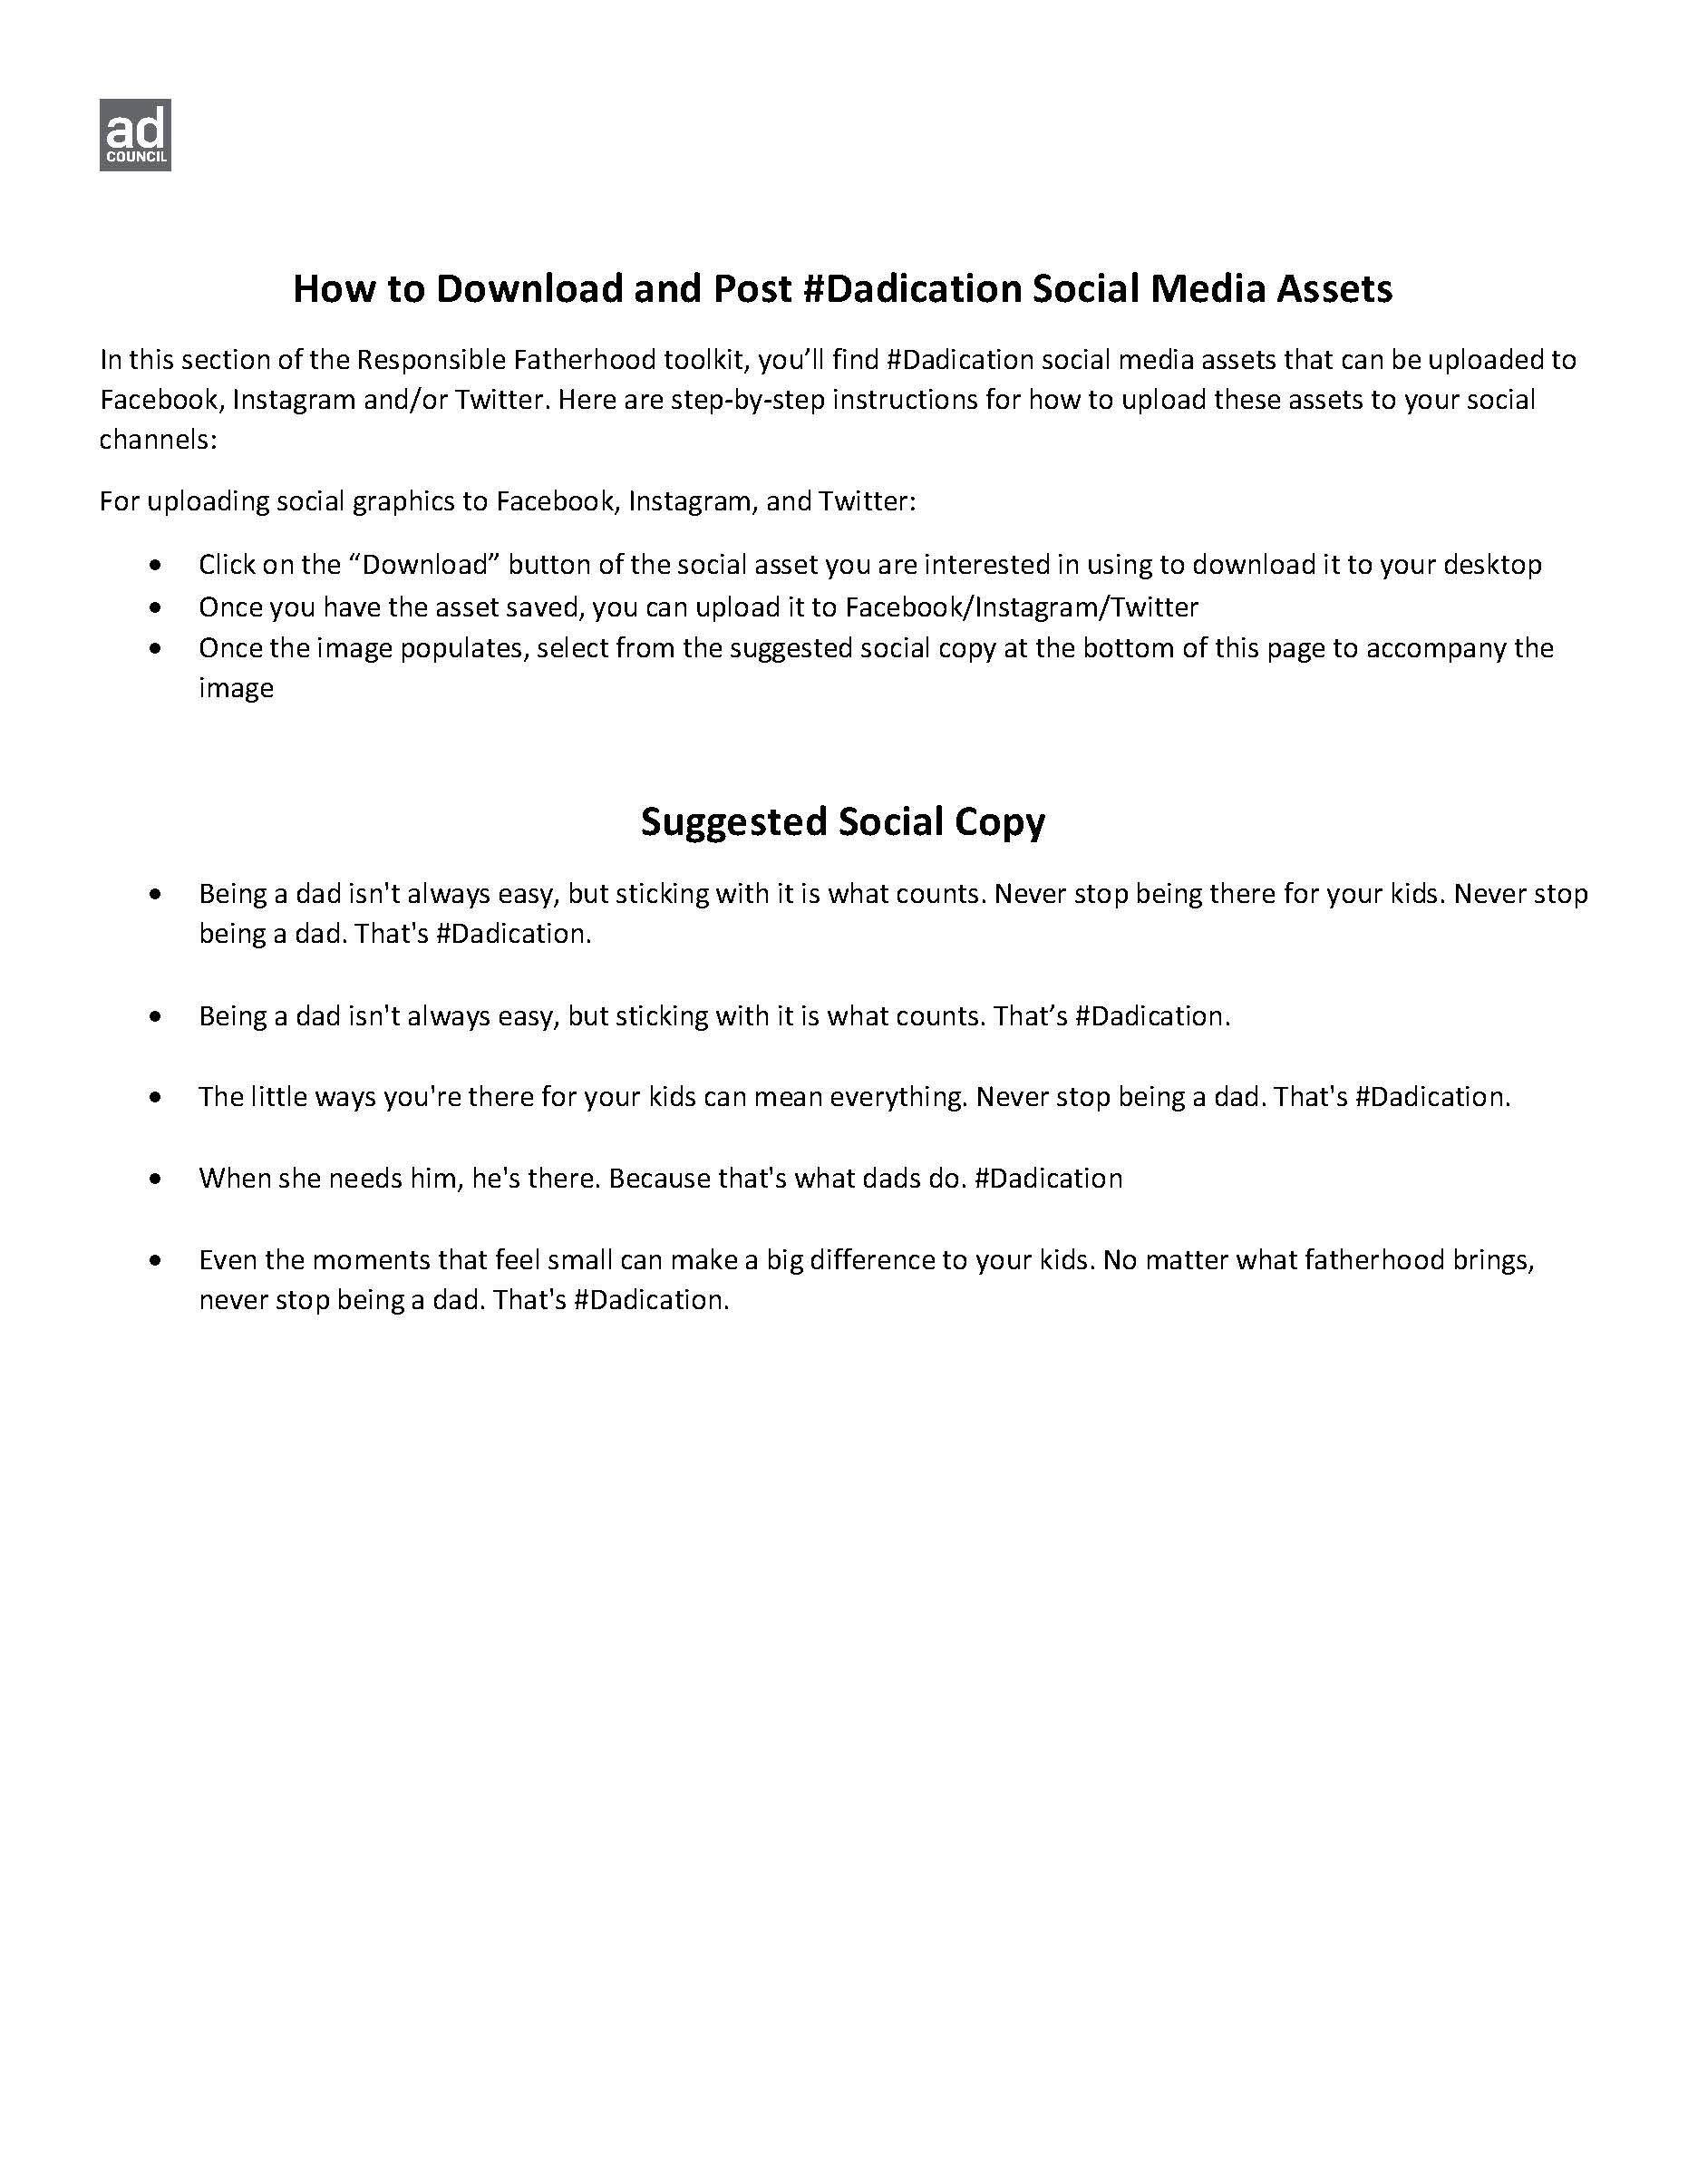 Dadication Sample Social Copy_2.26